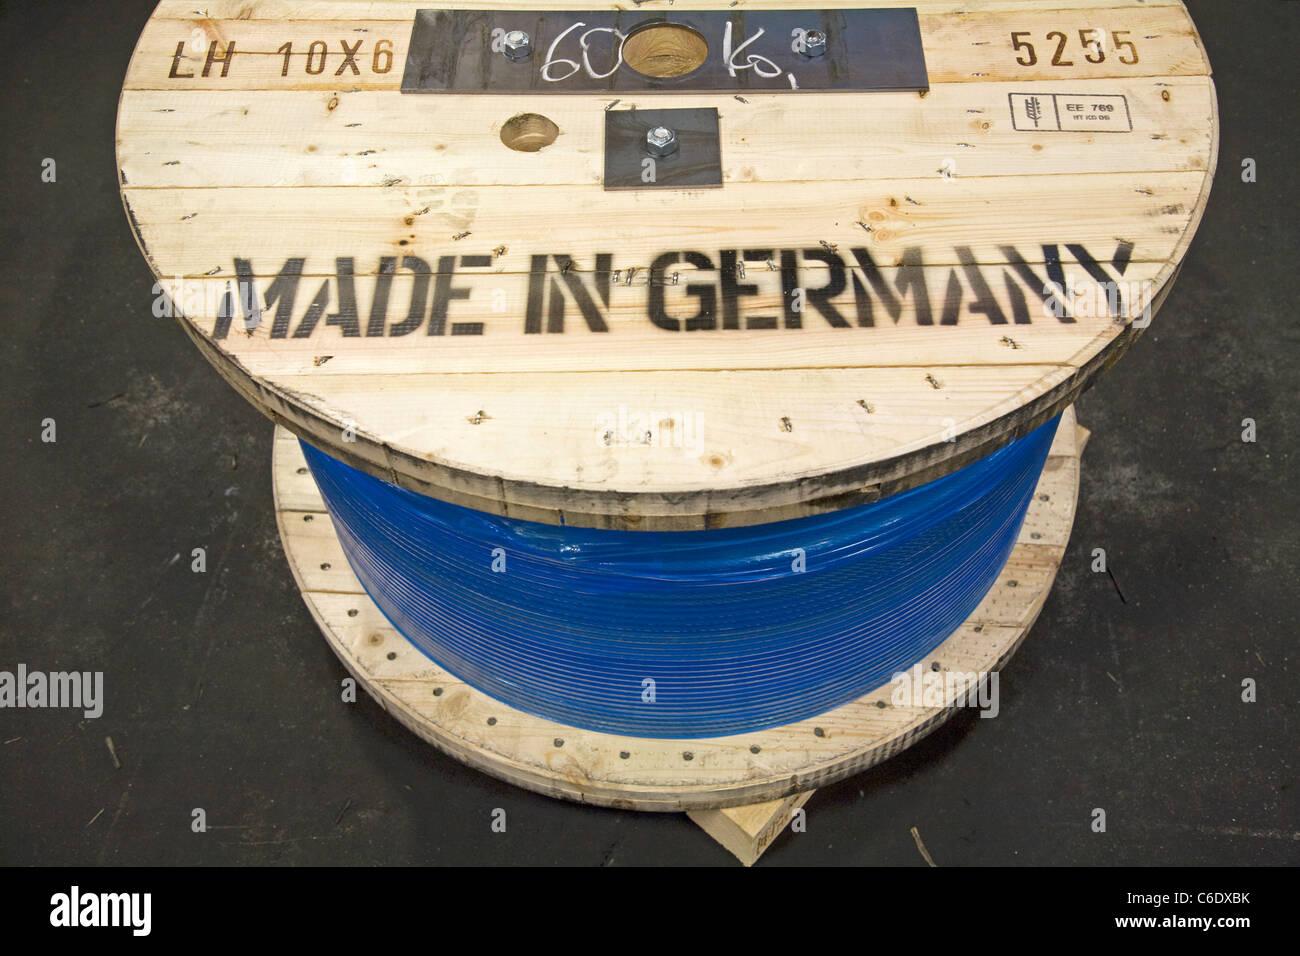 Pfeifer Drako wire rope factory, Muelheim an der Ruhr, Germany - Stock Image